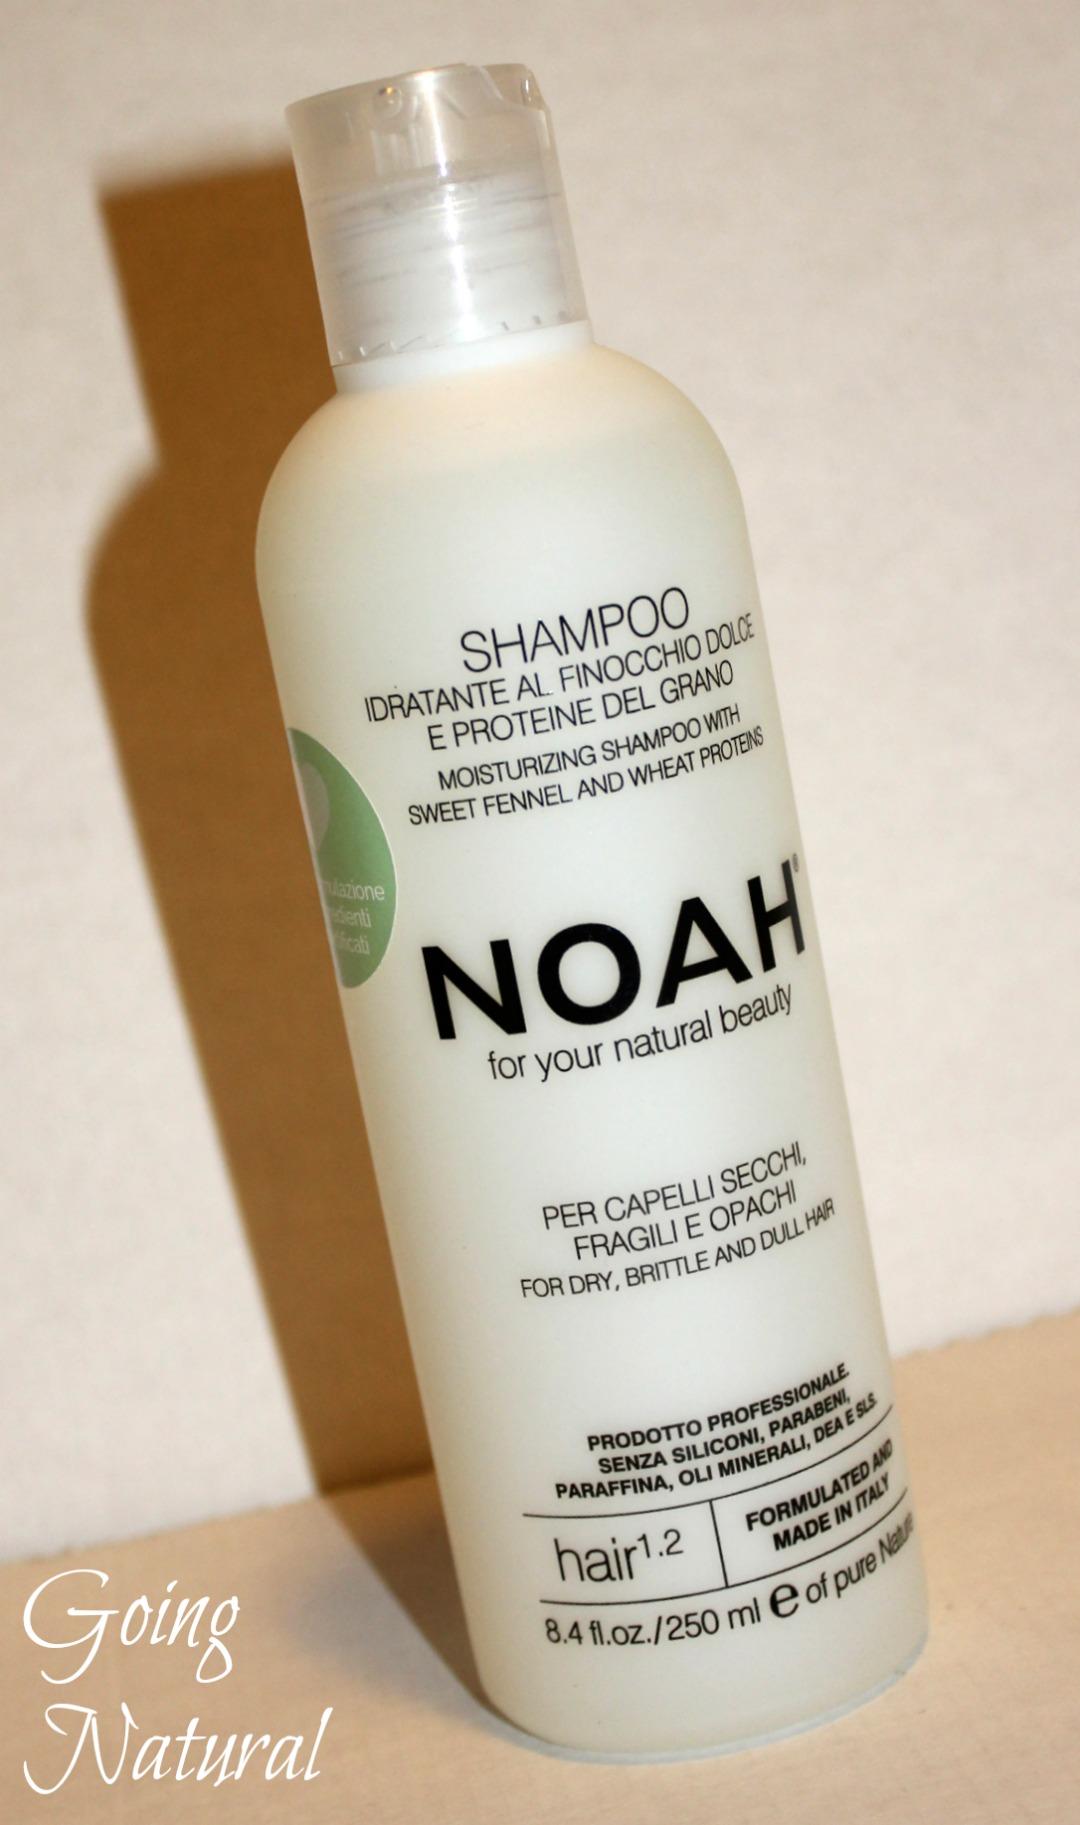 noah shampoo idratante